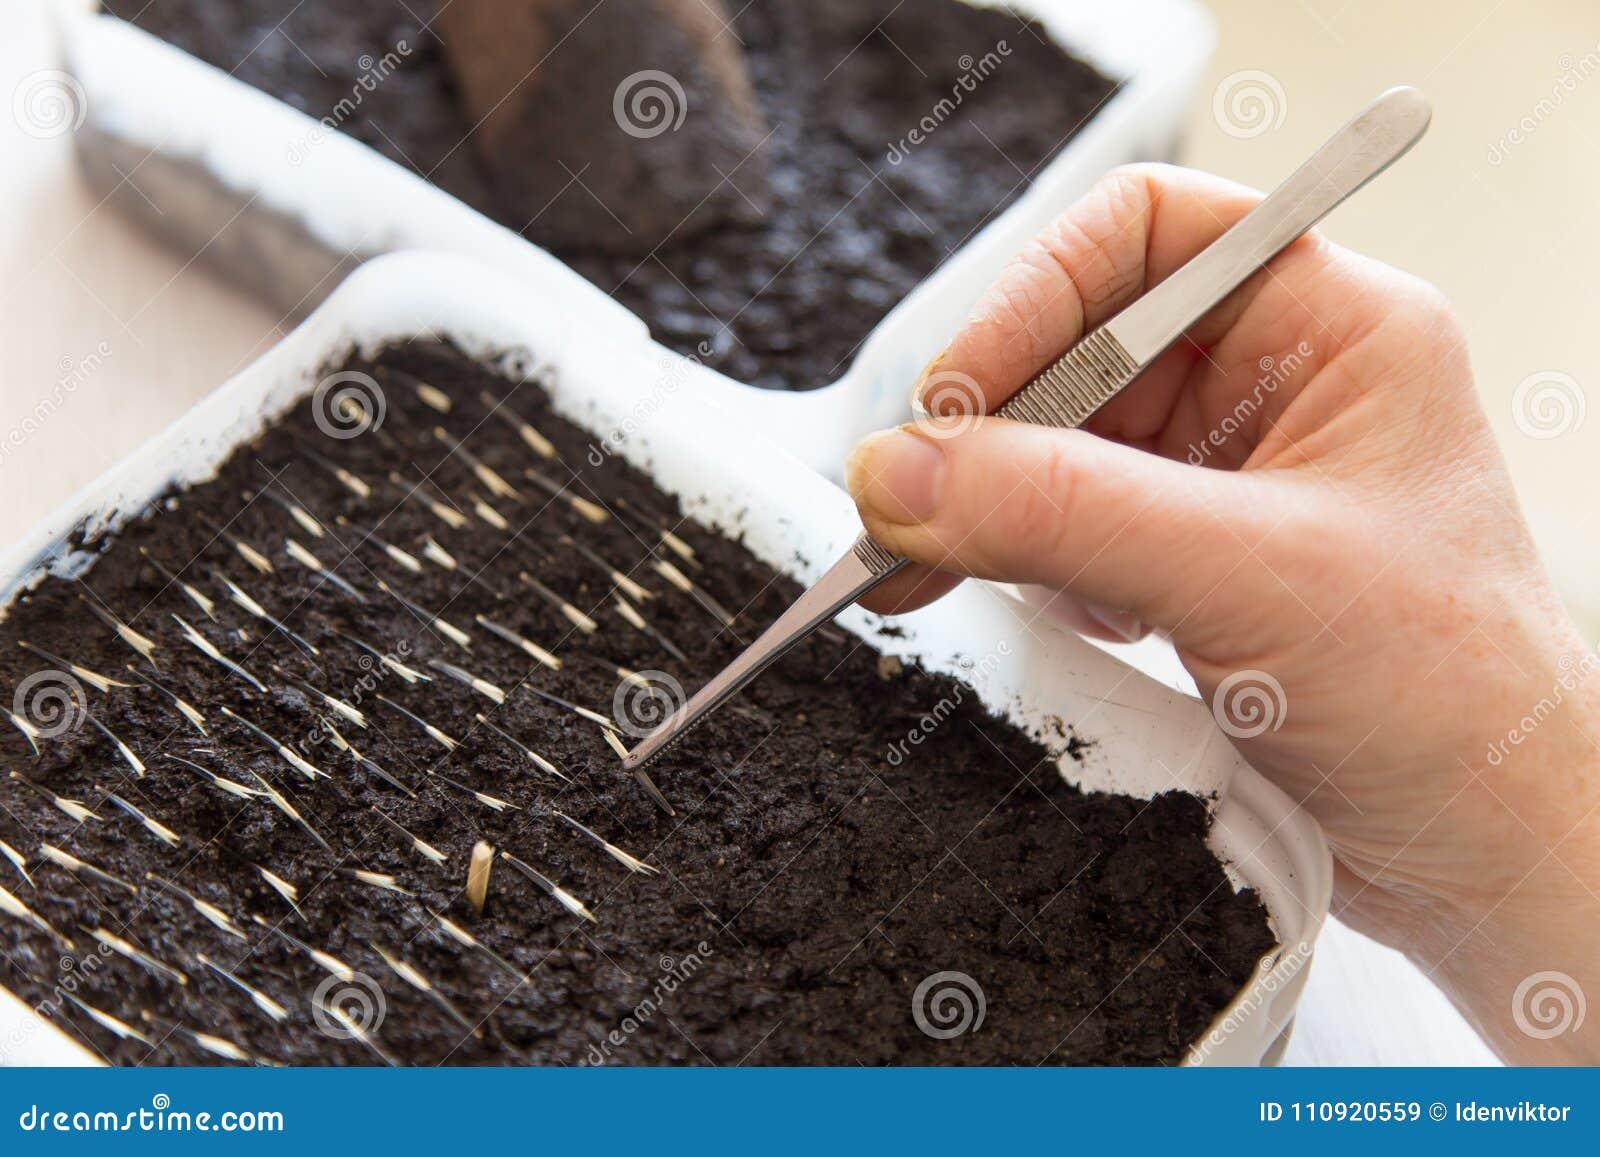 Planting flowers seeds in soil in spring closeup